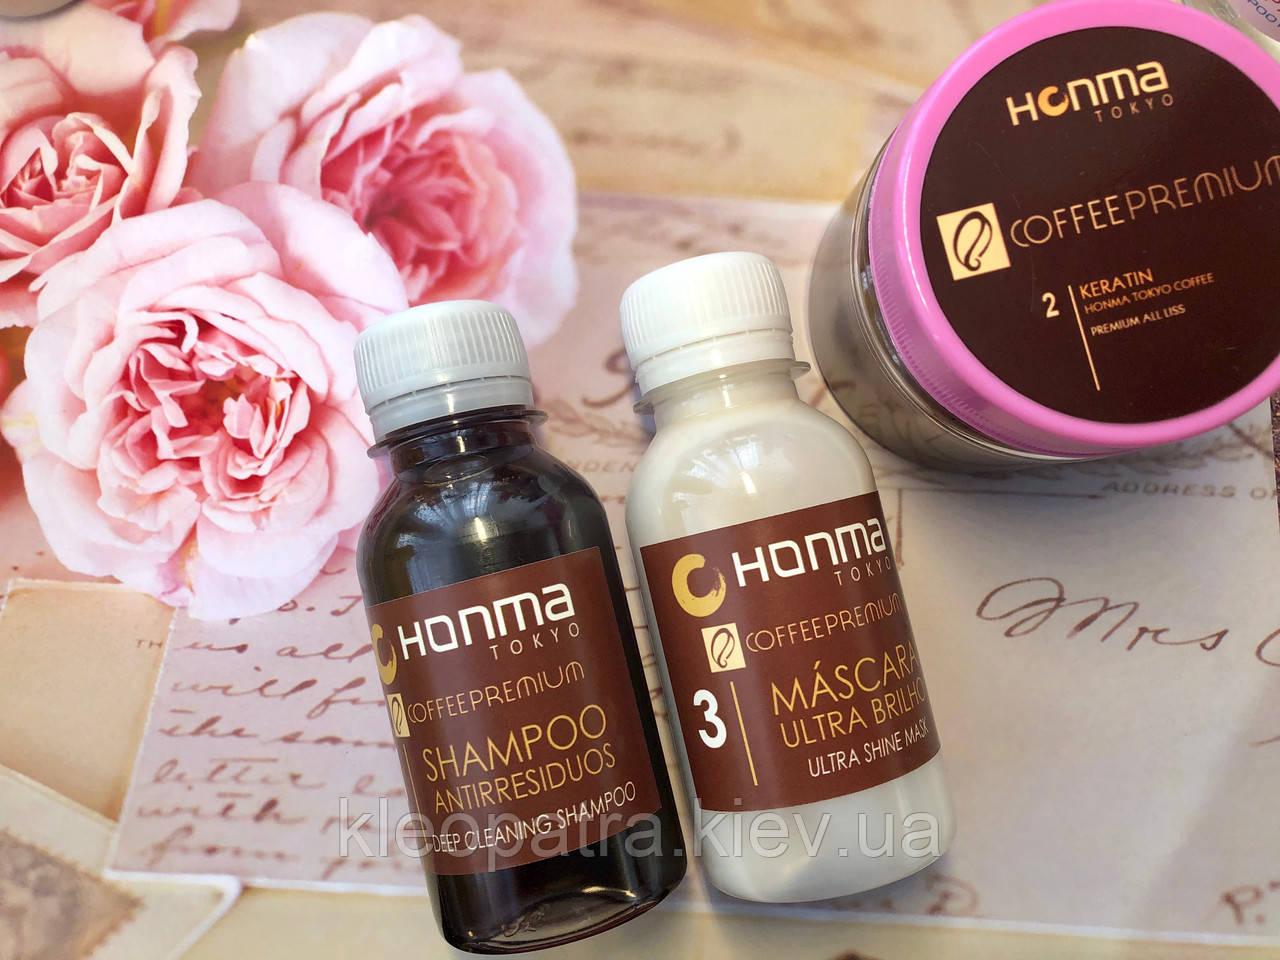 Набор для волос кератин honma tokyo coffee premium all liss 3* 100мл